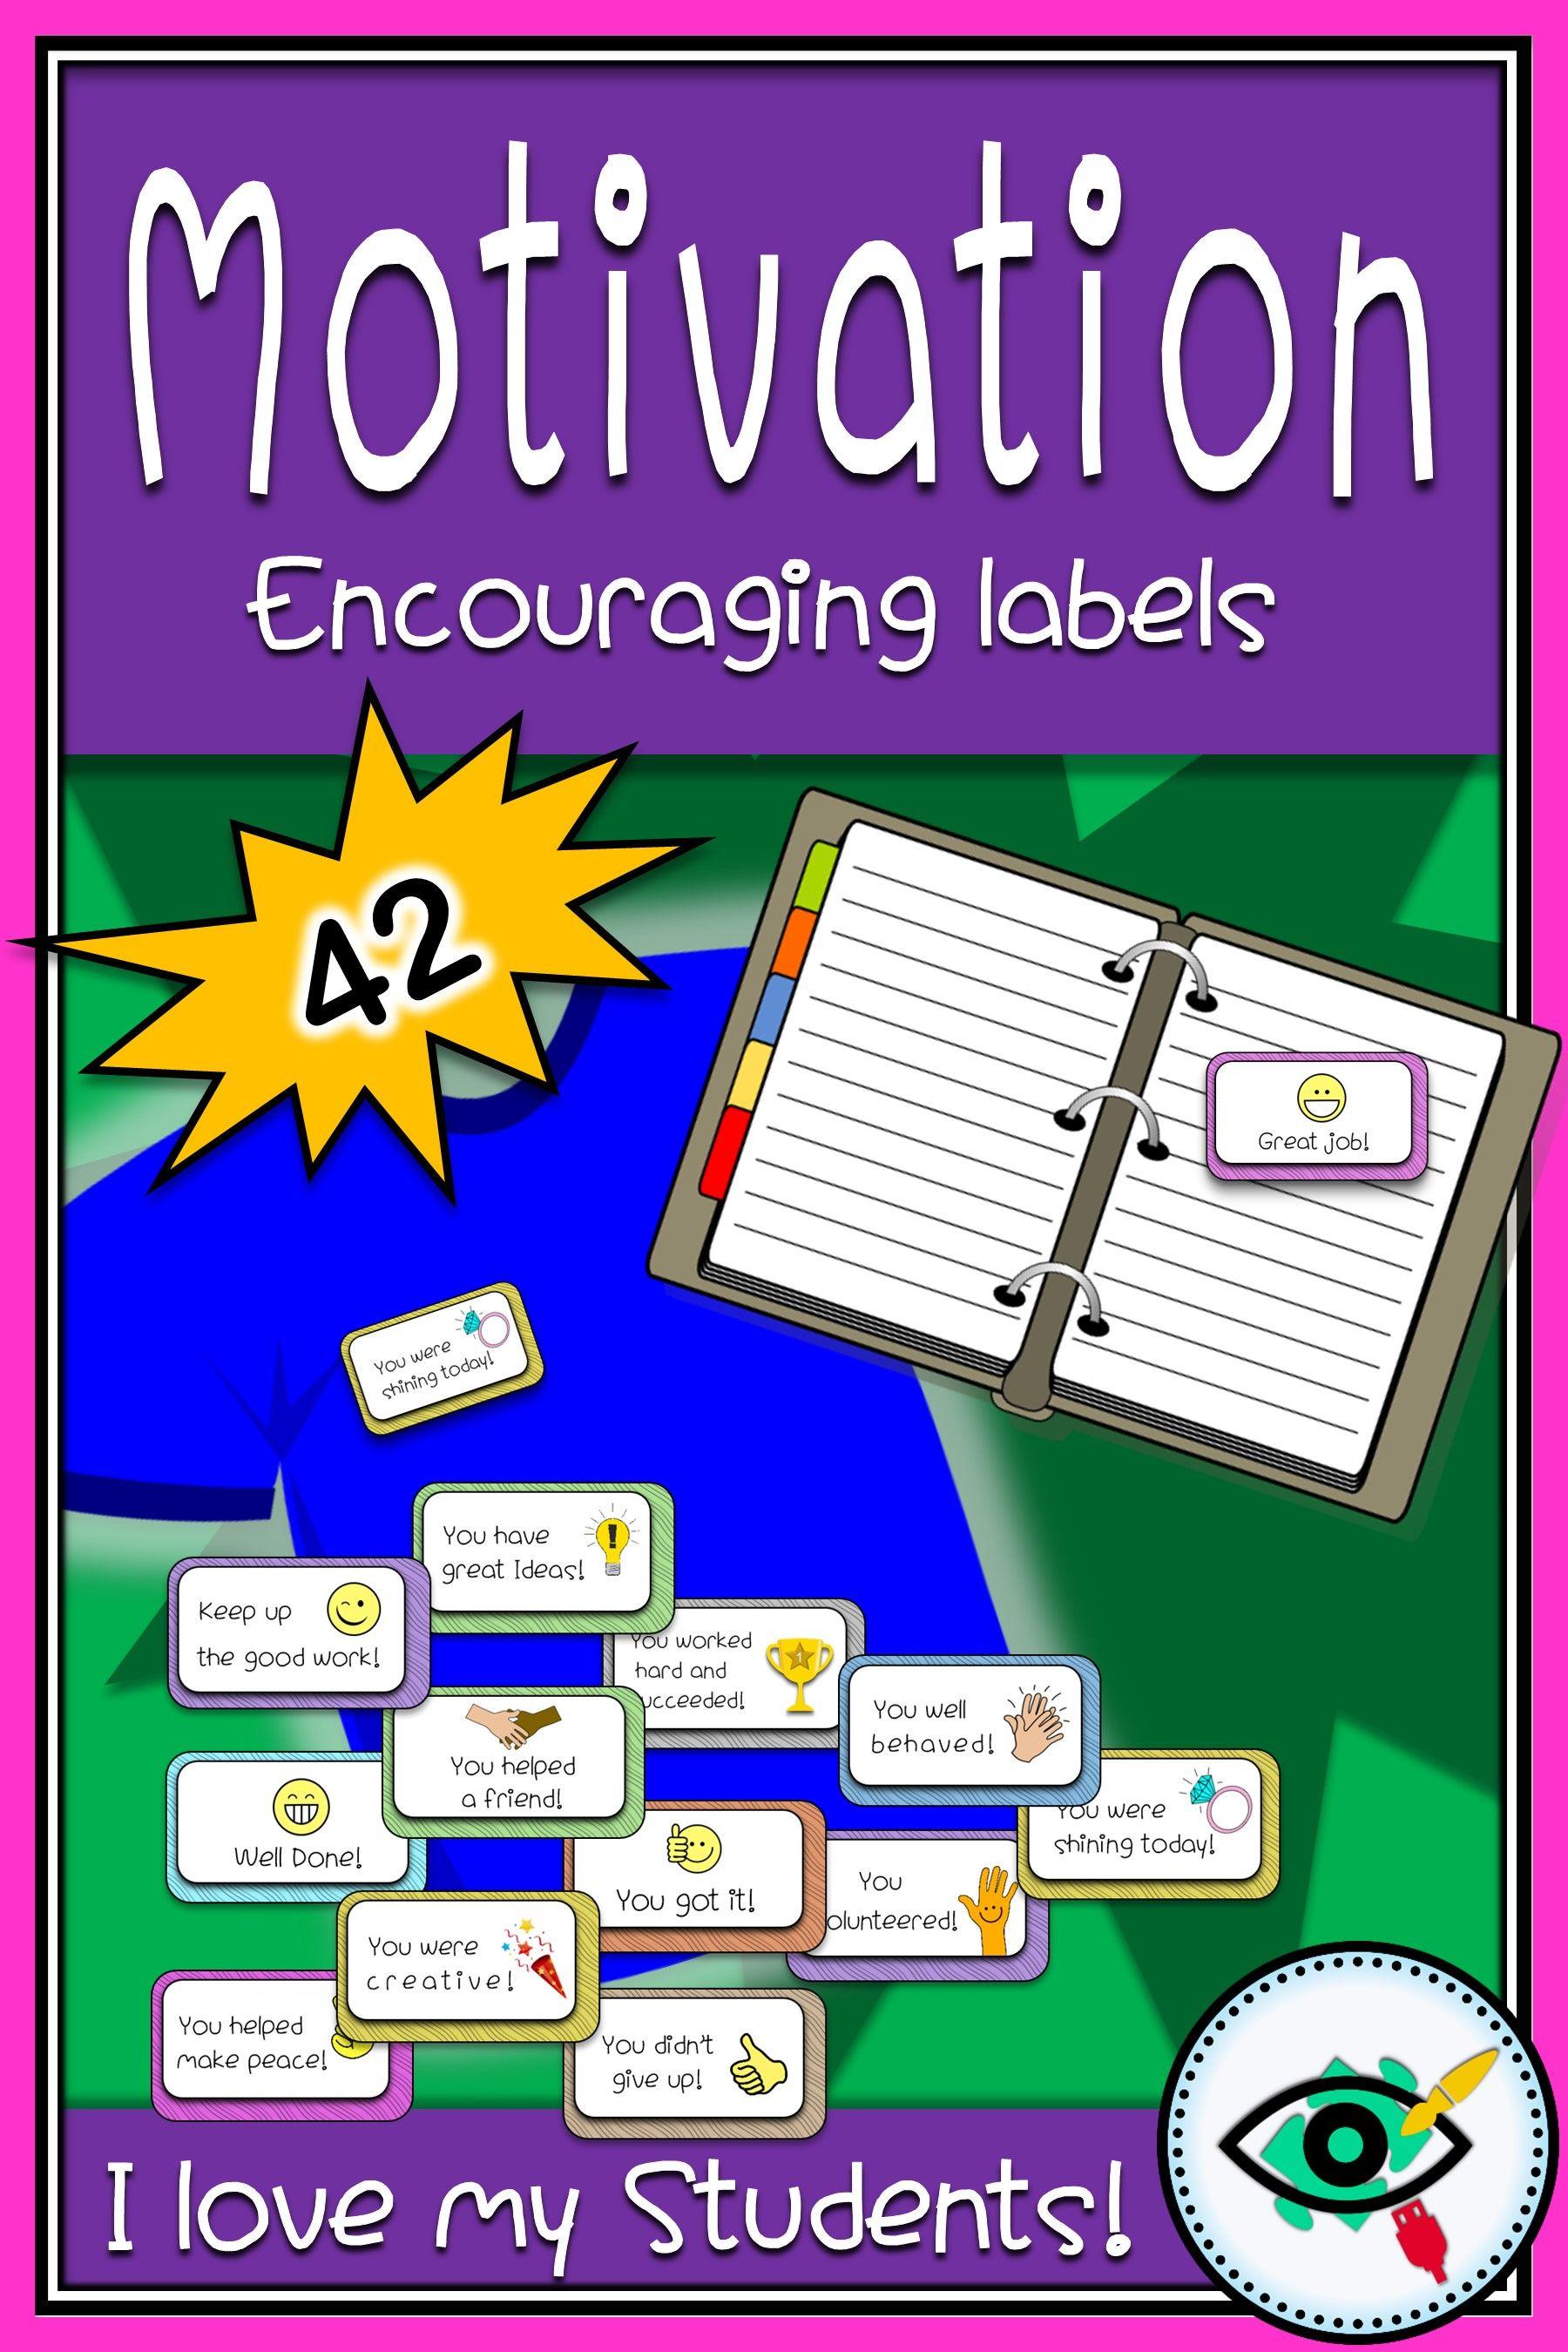 Motivation Encouraging Labels Printable